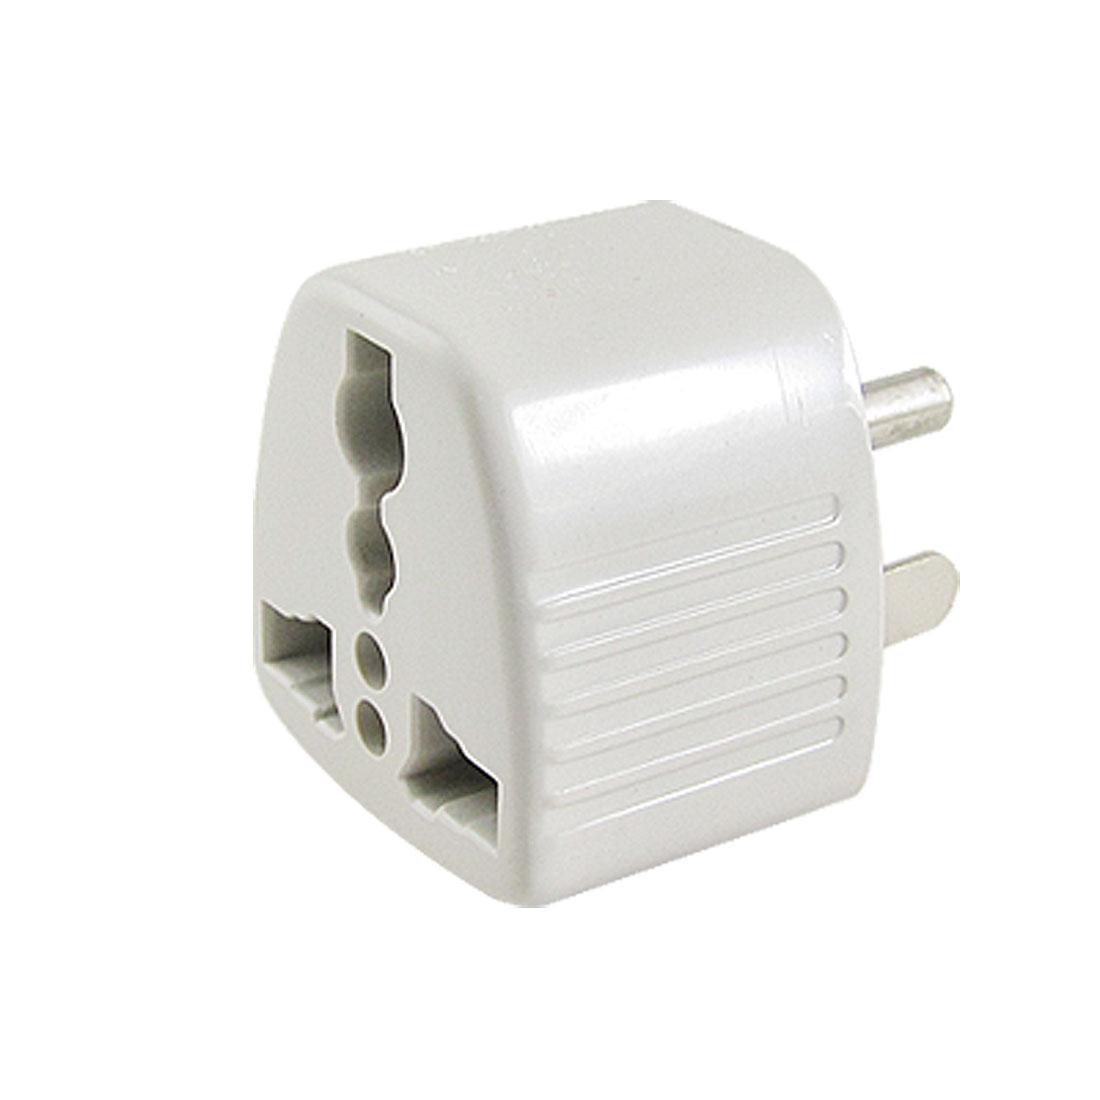 3 Pin US Plug AC 250V Travel Adapter Converter for AU EU UK Socket